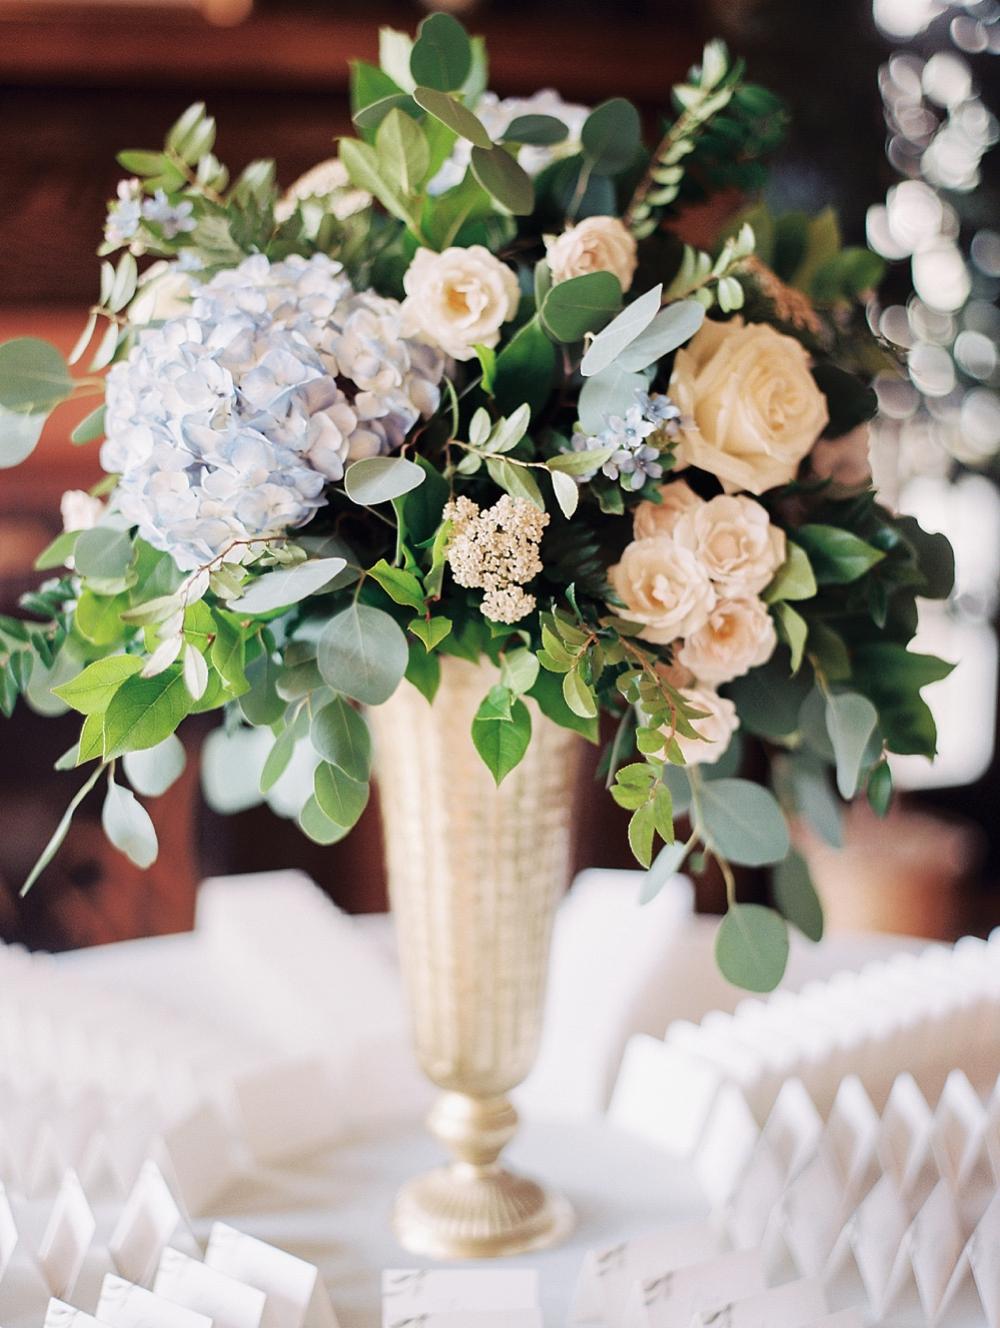 kristin-la-voie-photography-lehmann-mansion-wedding-photographer-220